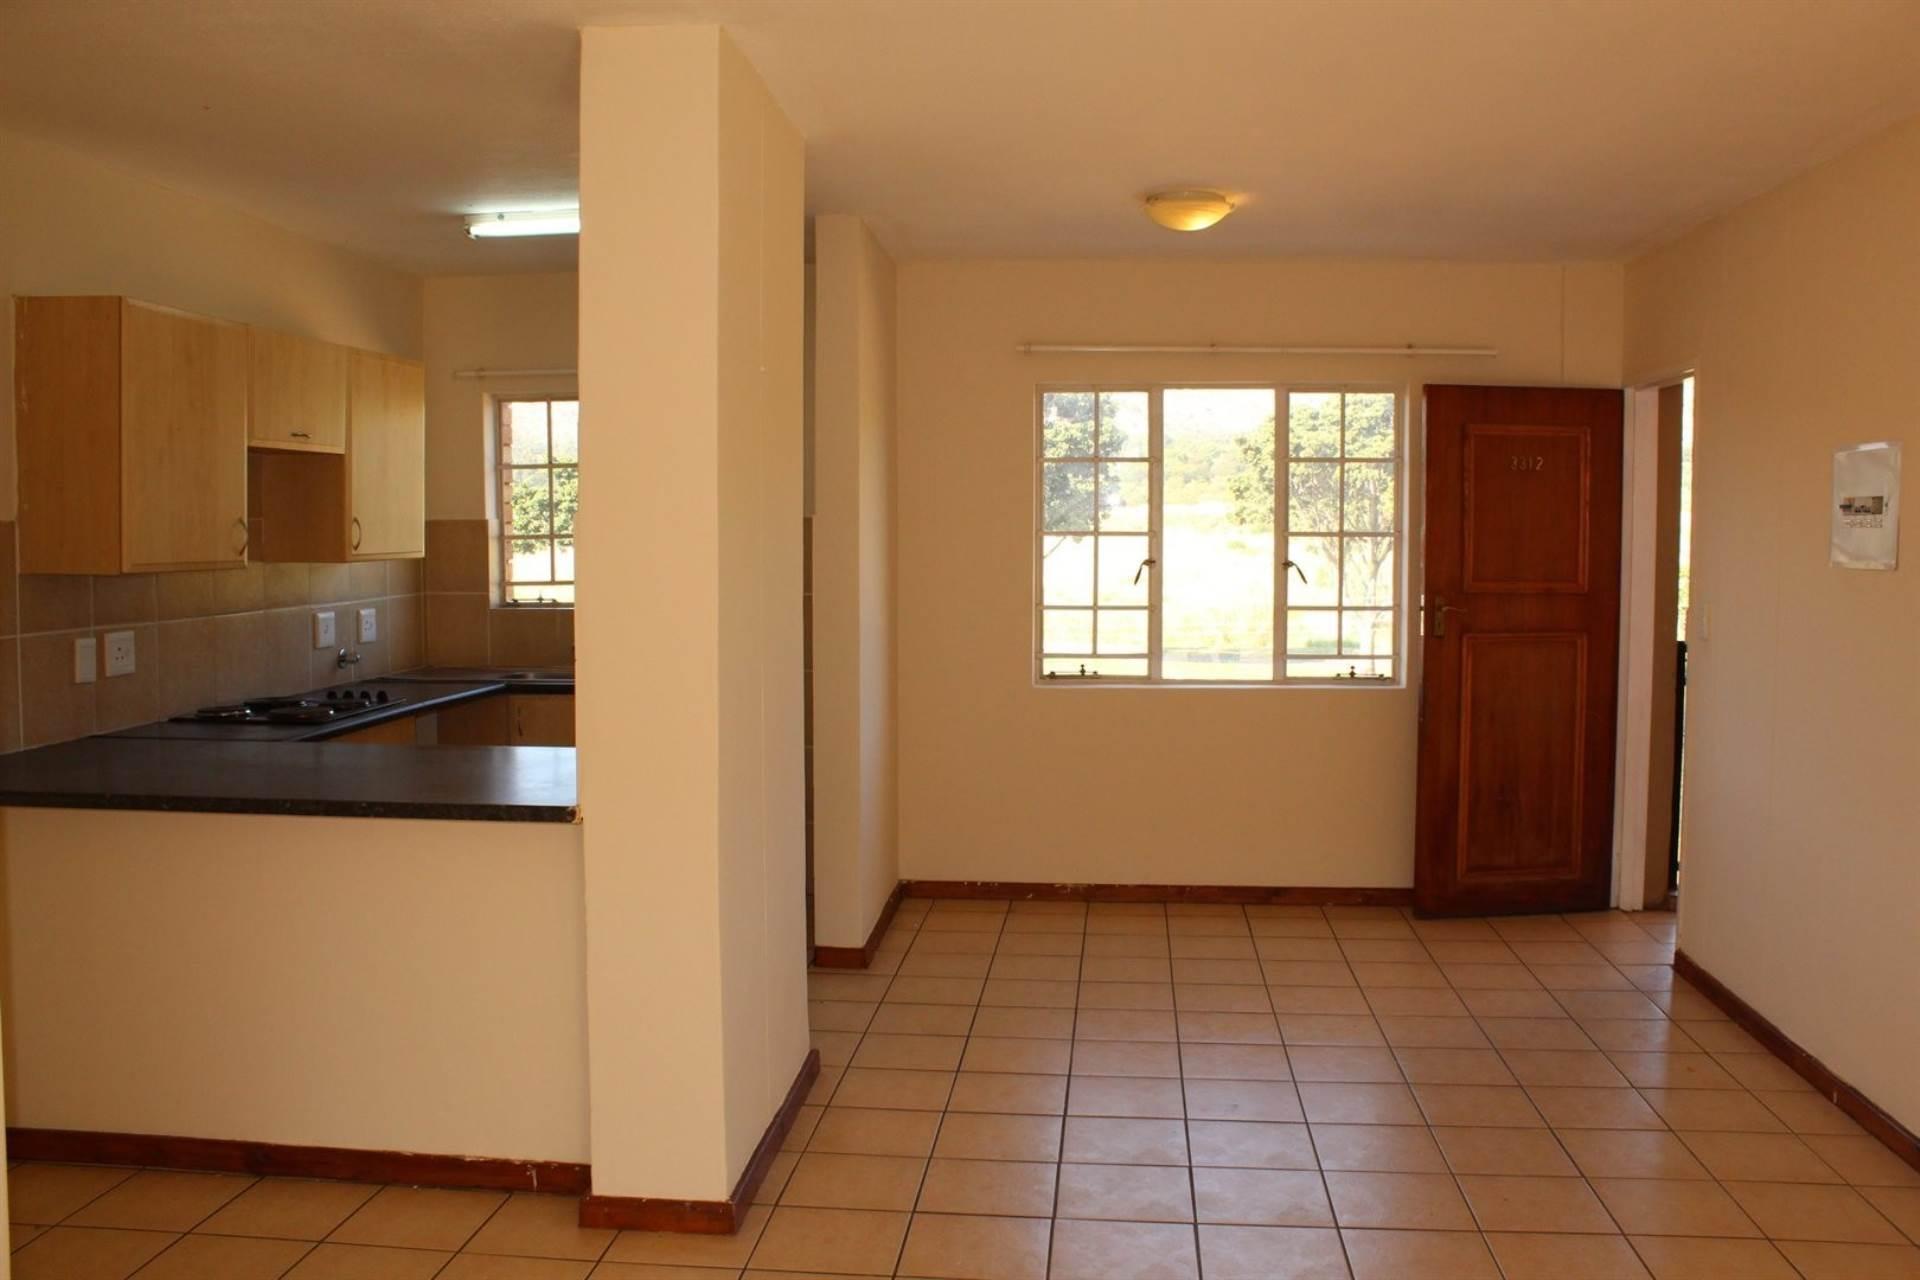 Akasia, Karenpark Property    Houses For Sale Karenpark, KARENPARK, Flats 3 bedrooms property for sale Price:550,000